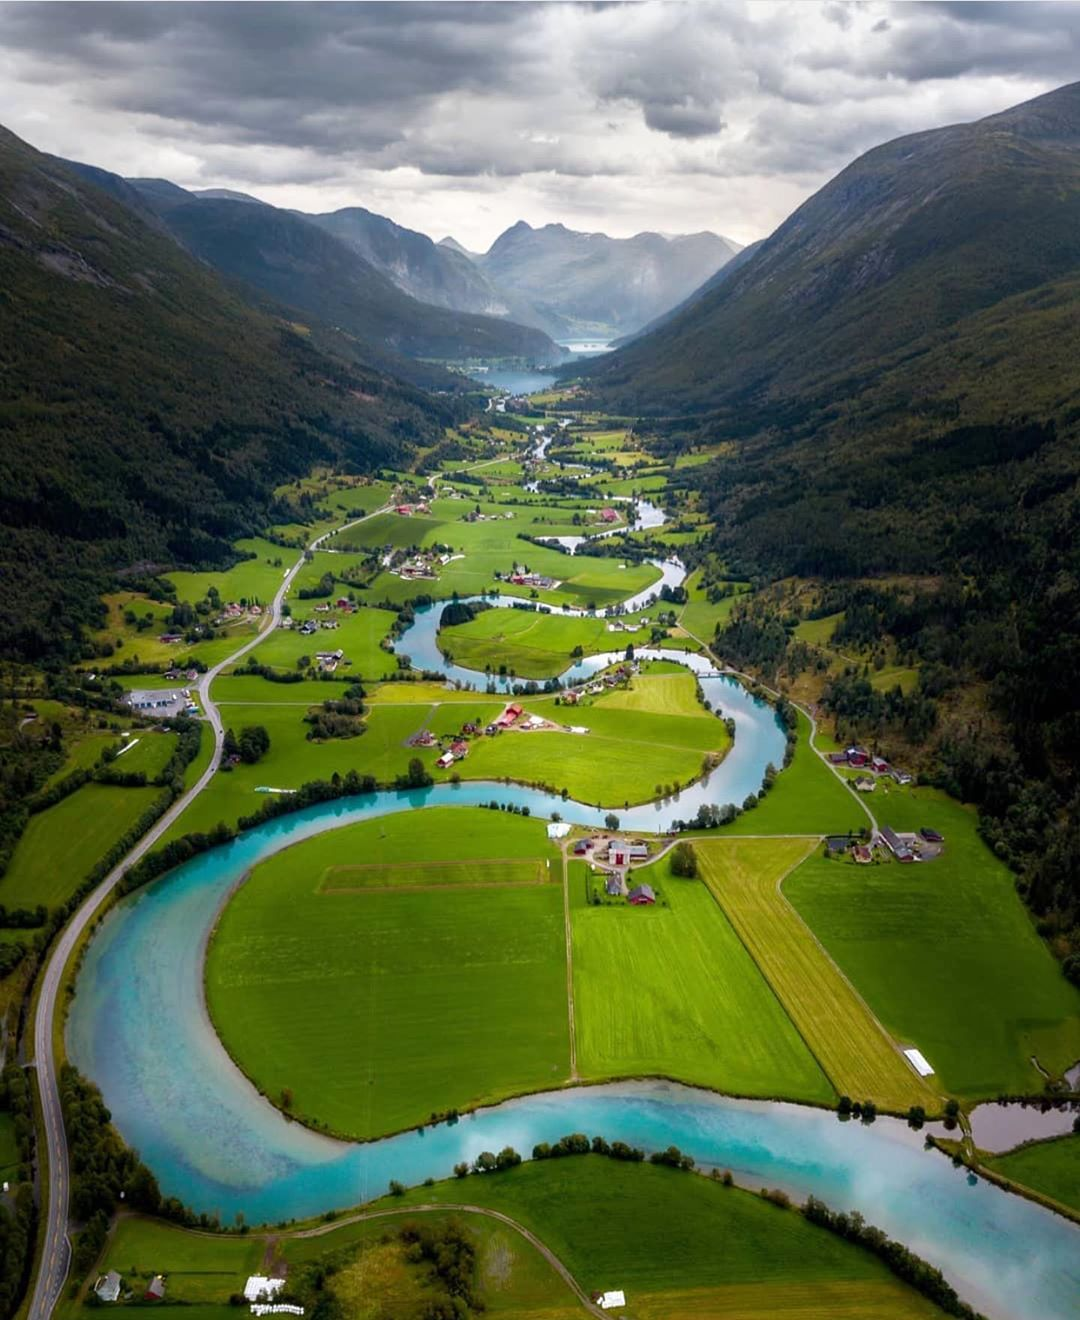 landscape photography river stryneelva in norway by viktor asztalos